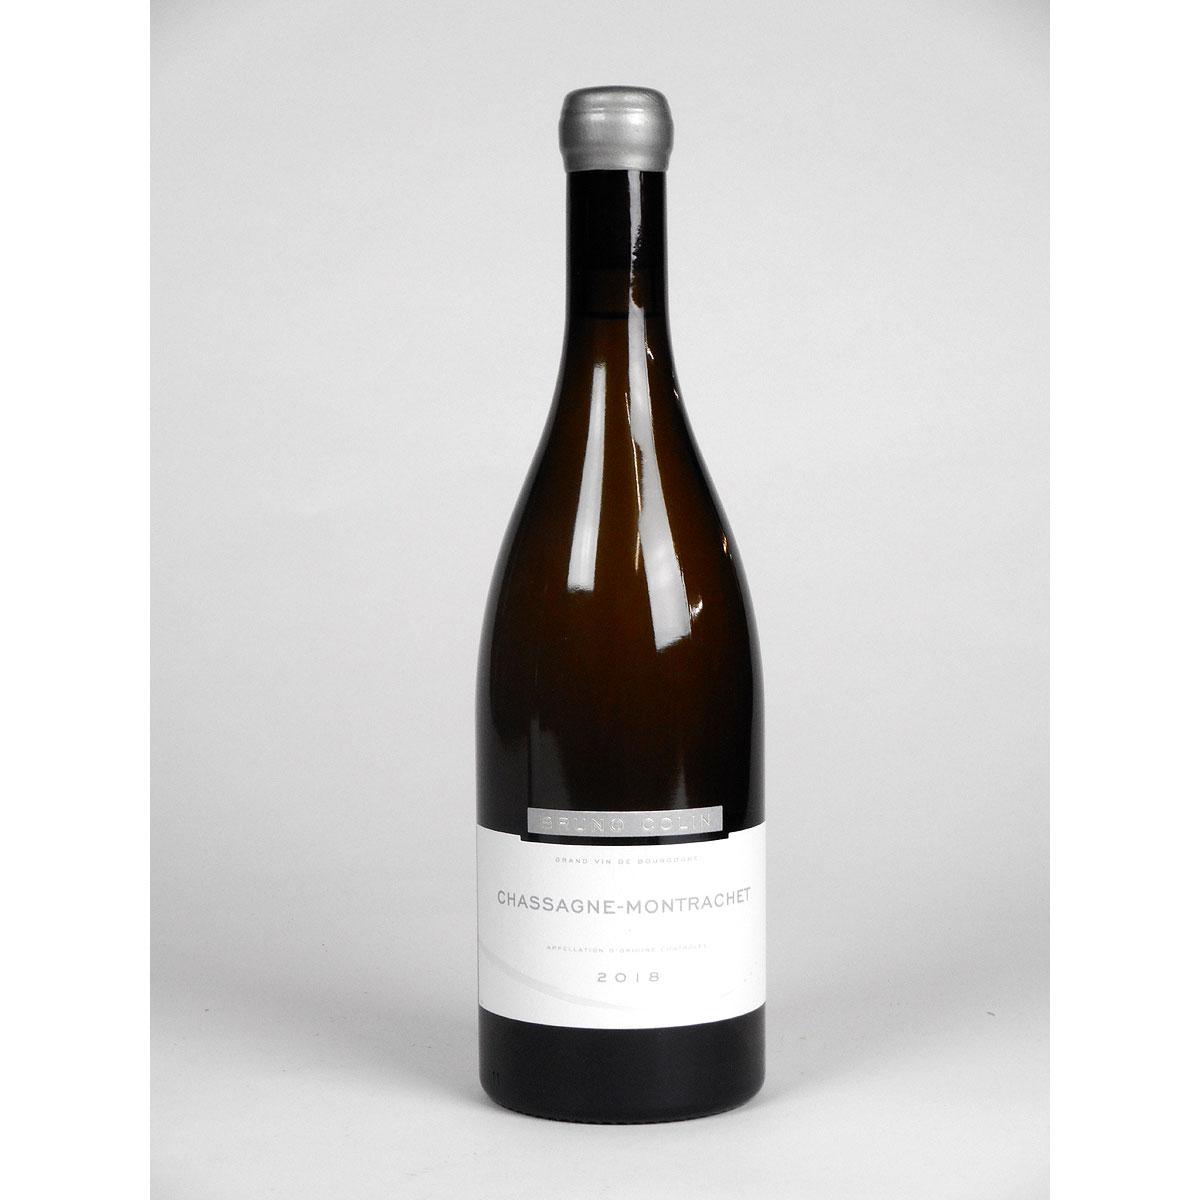 Chassagne-Montrachet: Domaine Bruno Colin 2018 - Bottle